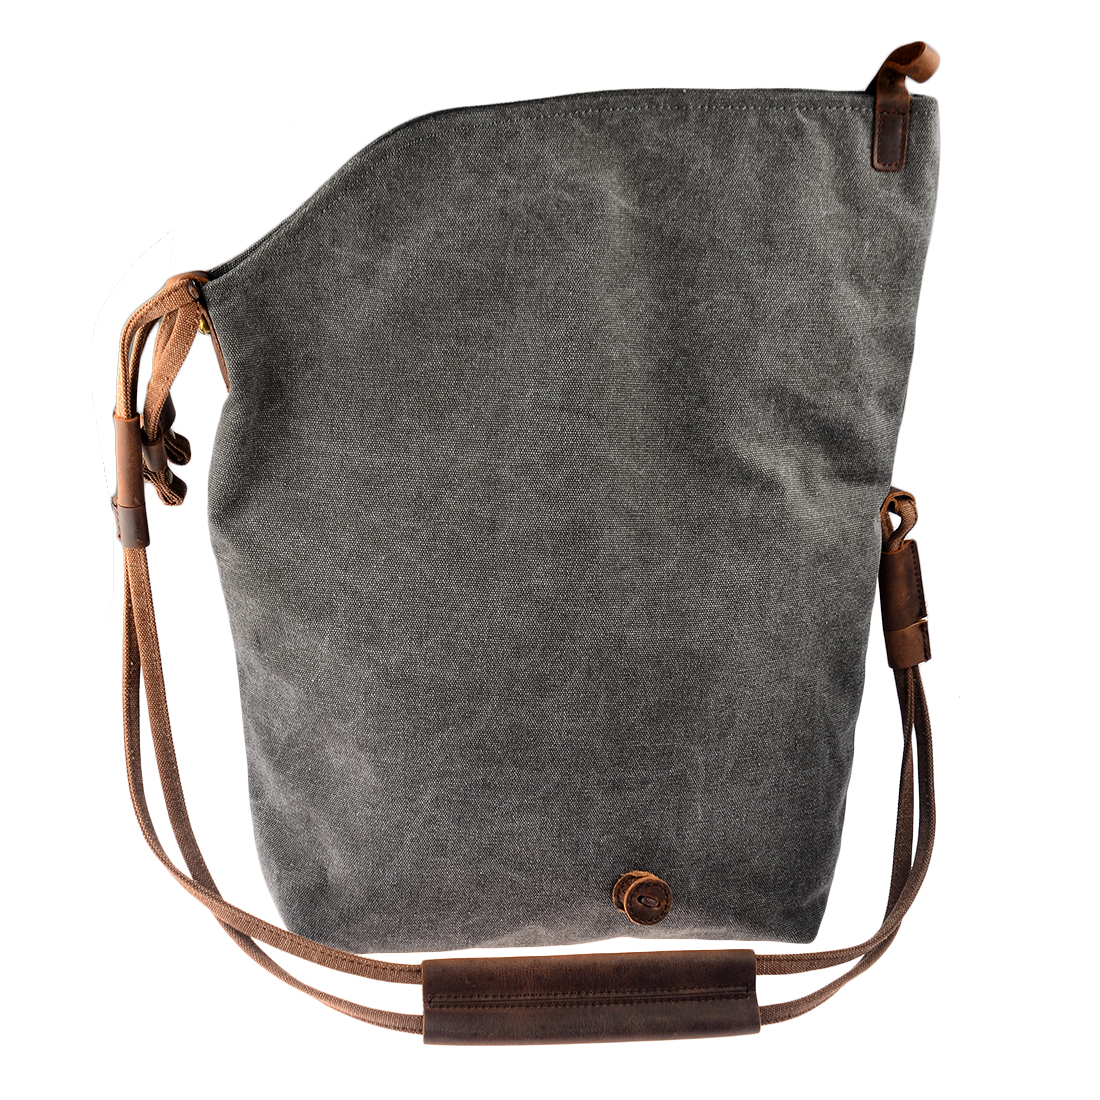 Women Bag Cross Body Vintage Casual Crazy Horse Leather Canvas Crossbody Bags Messenger Shouder Bag Ladies Bolsa Feminina Girls